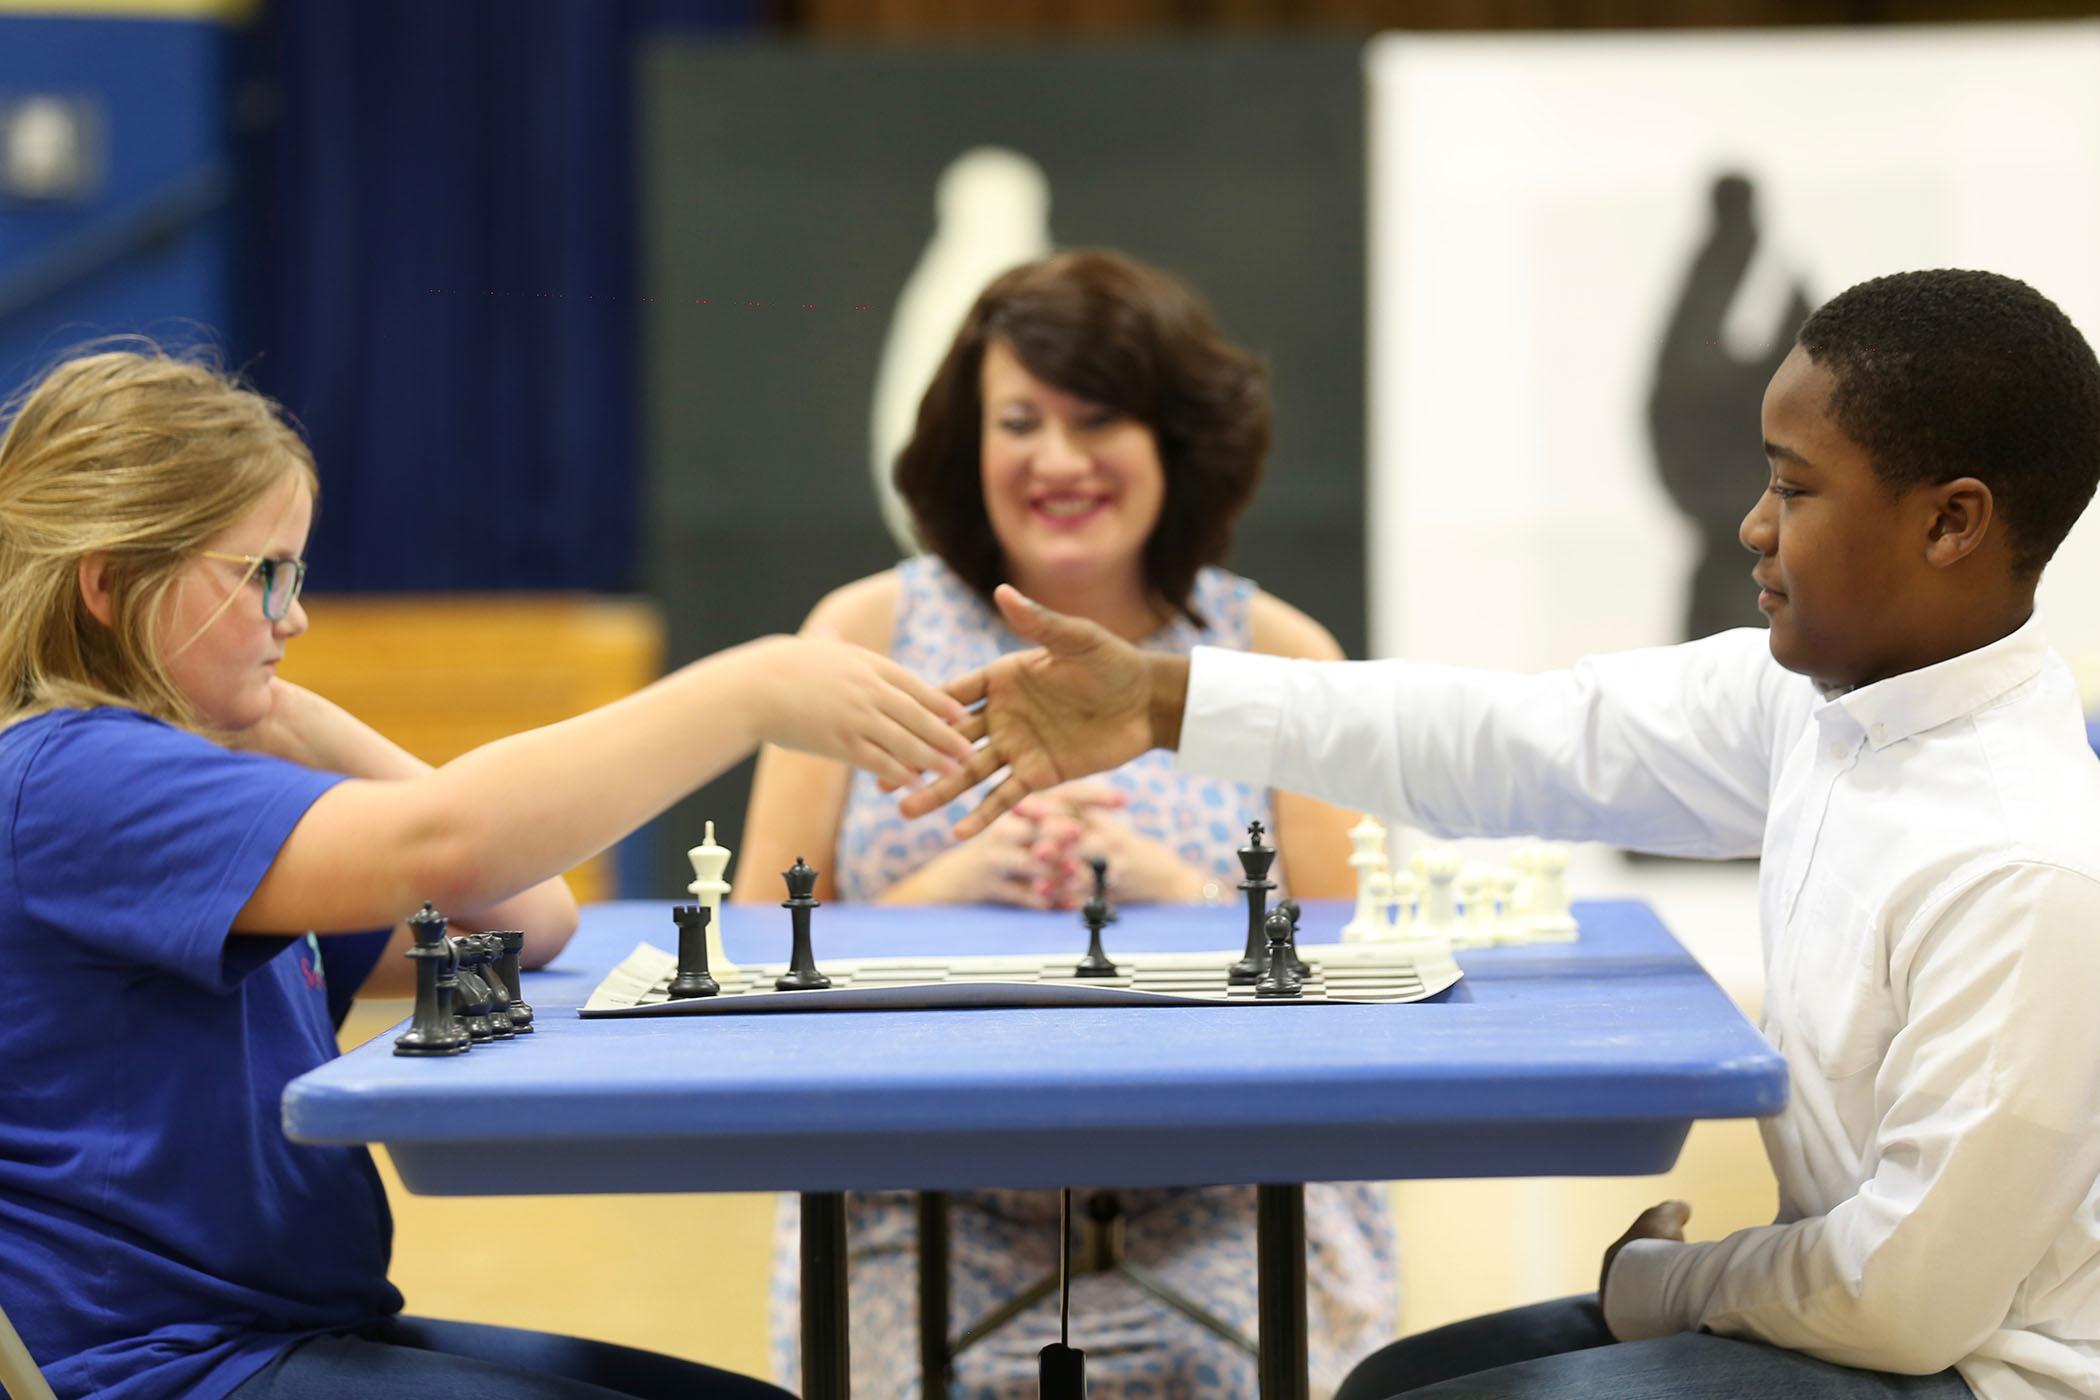 Jorian and Mindi shake hands after the championship match.